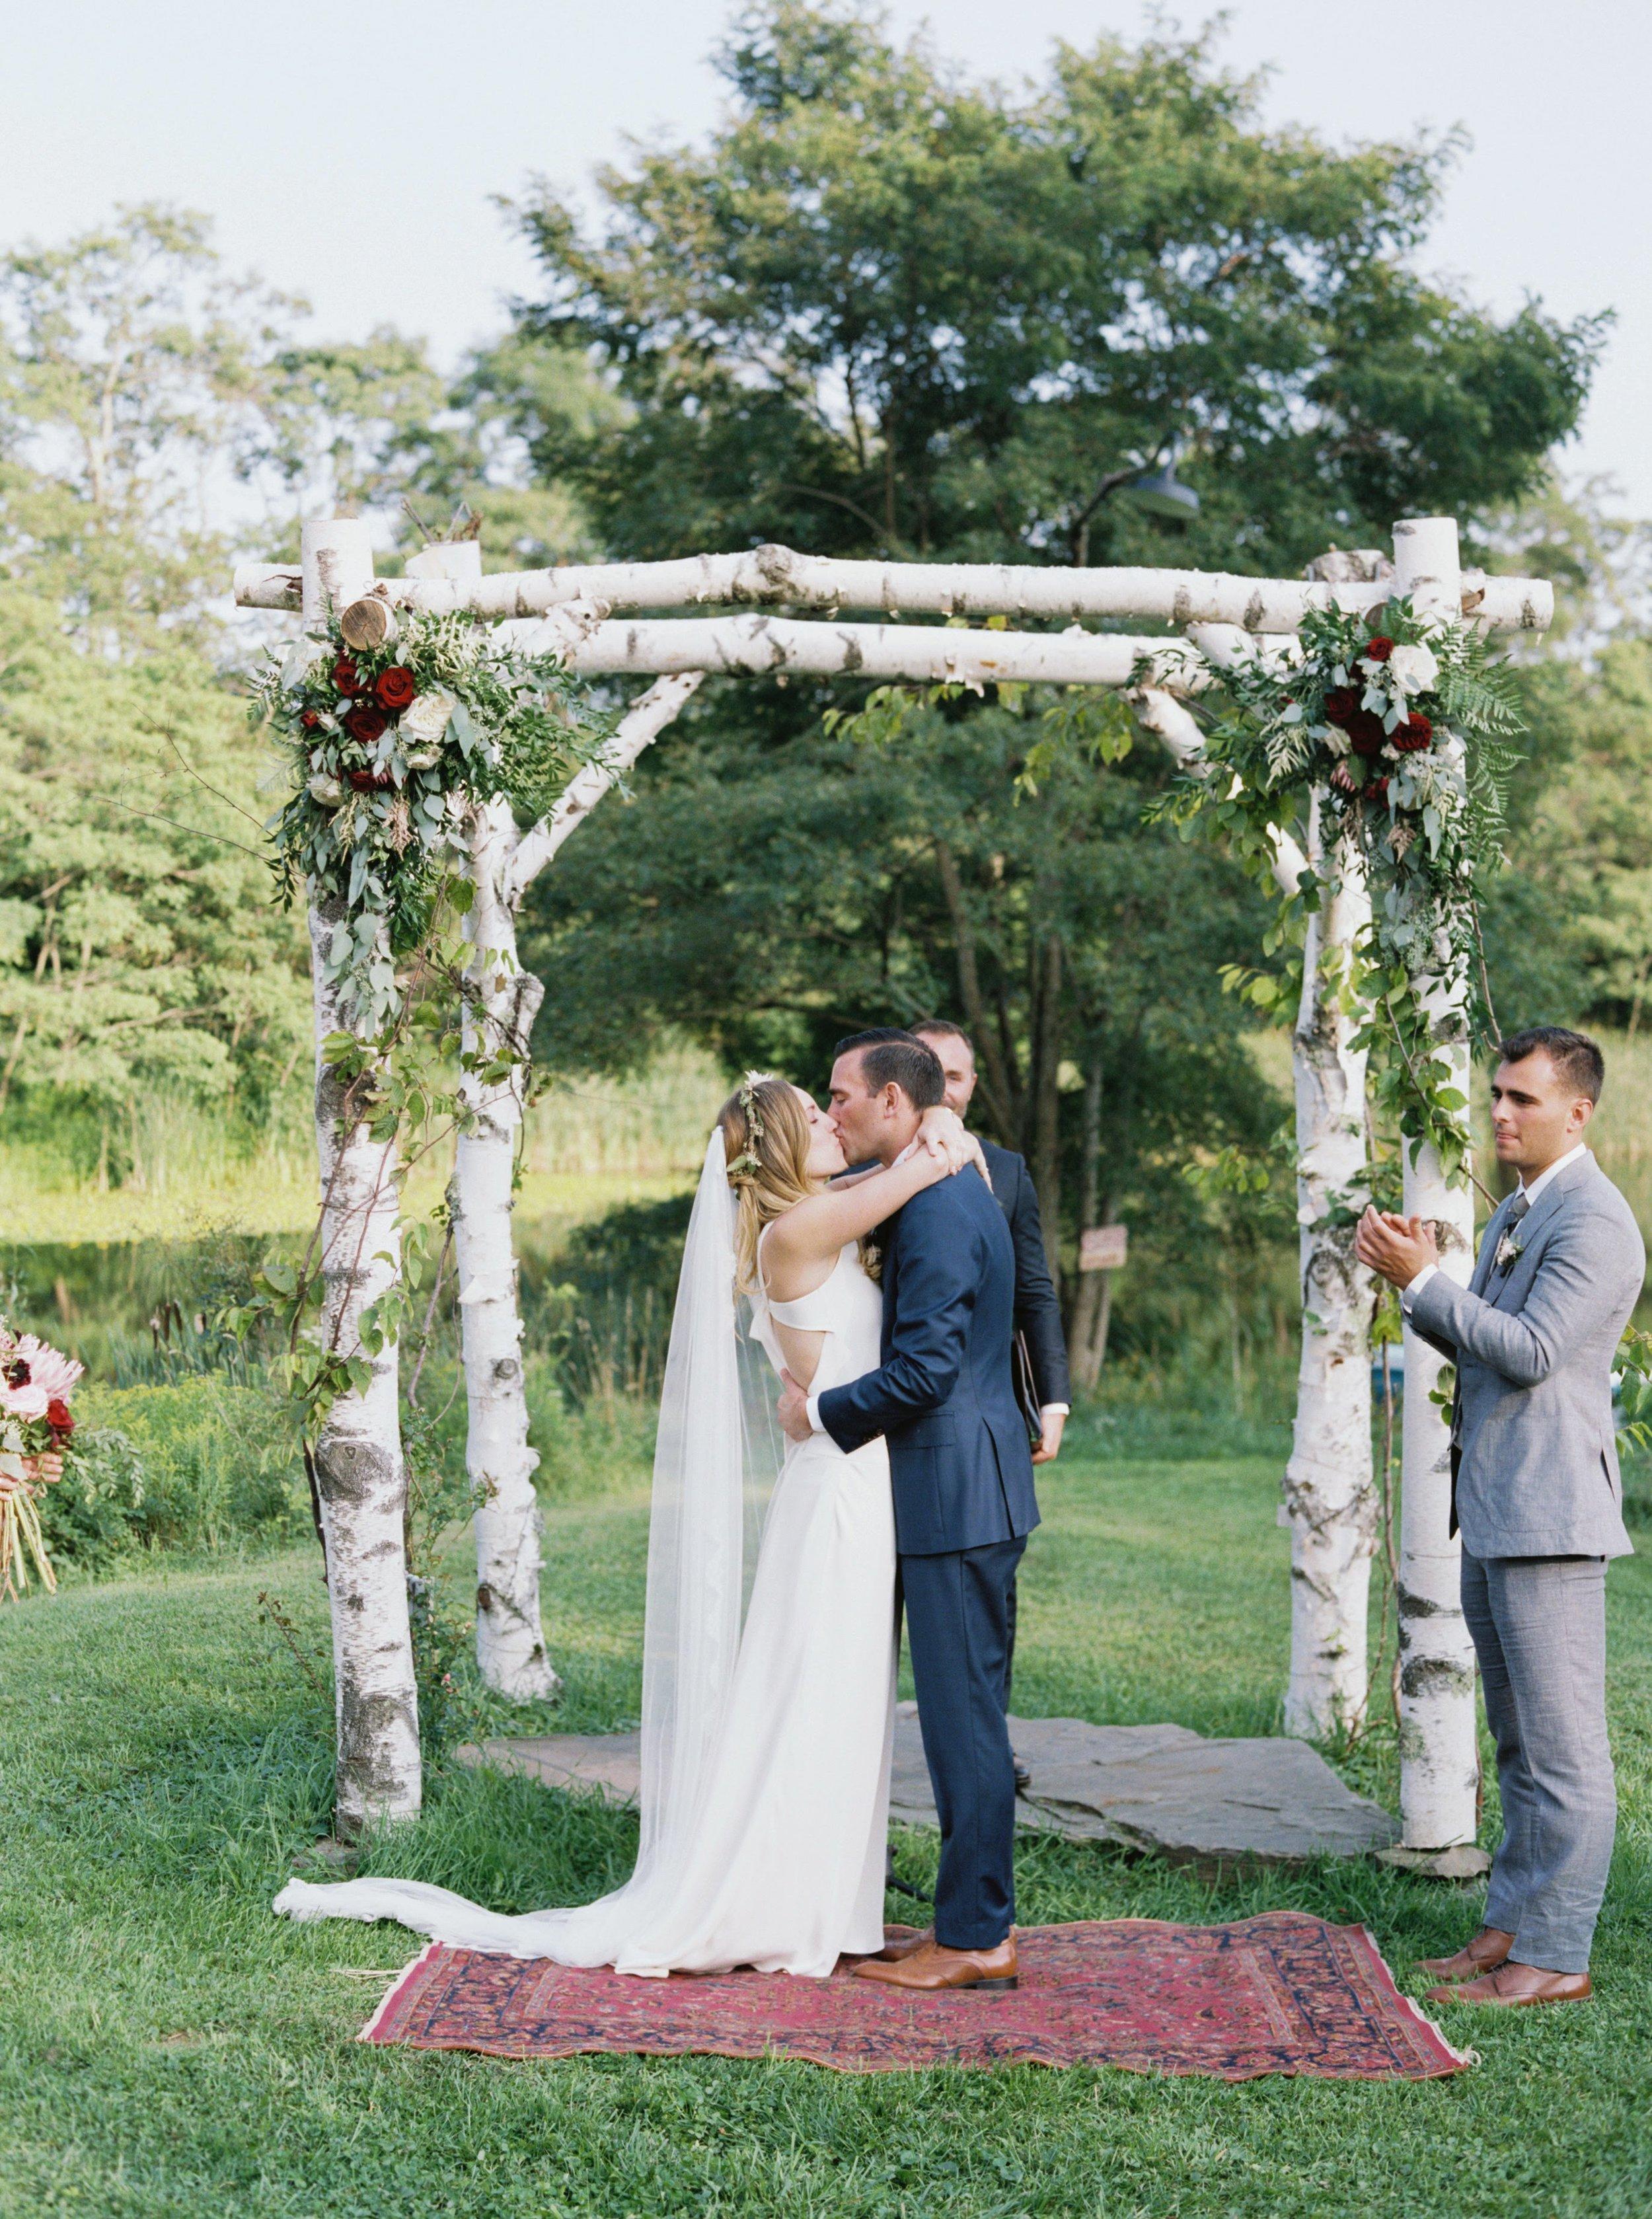 Courtney + Matt Blenheim Hill Farm Catskills NY Wedding Veronica Lola Photography 2017-423.jpg